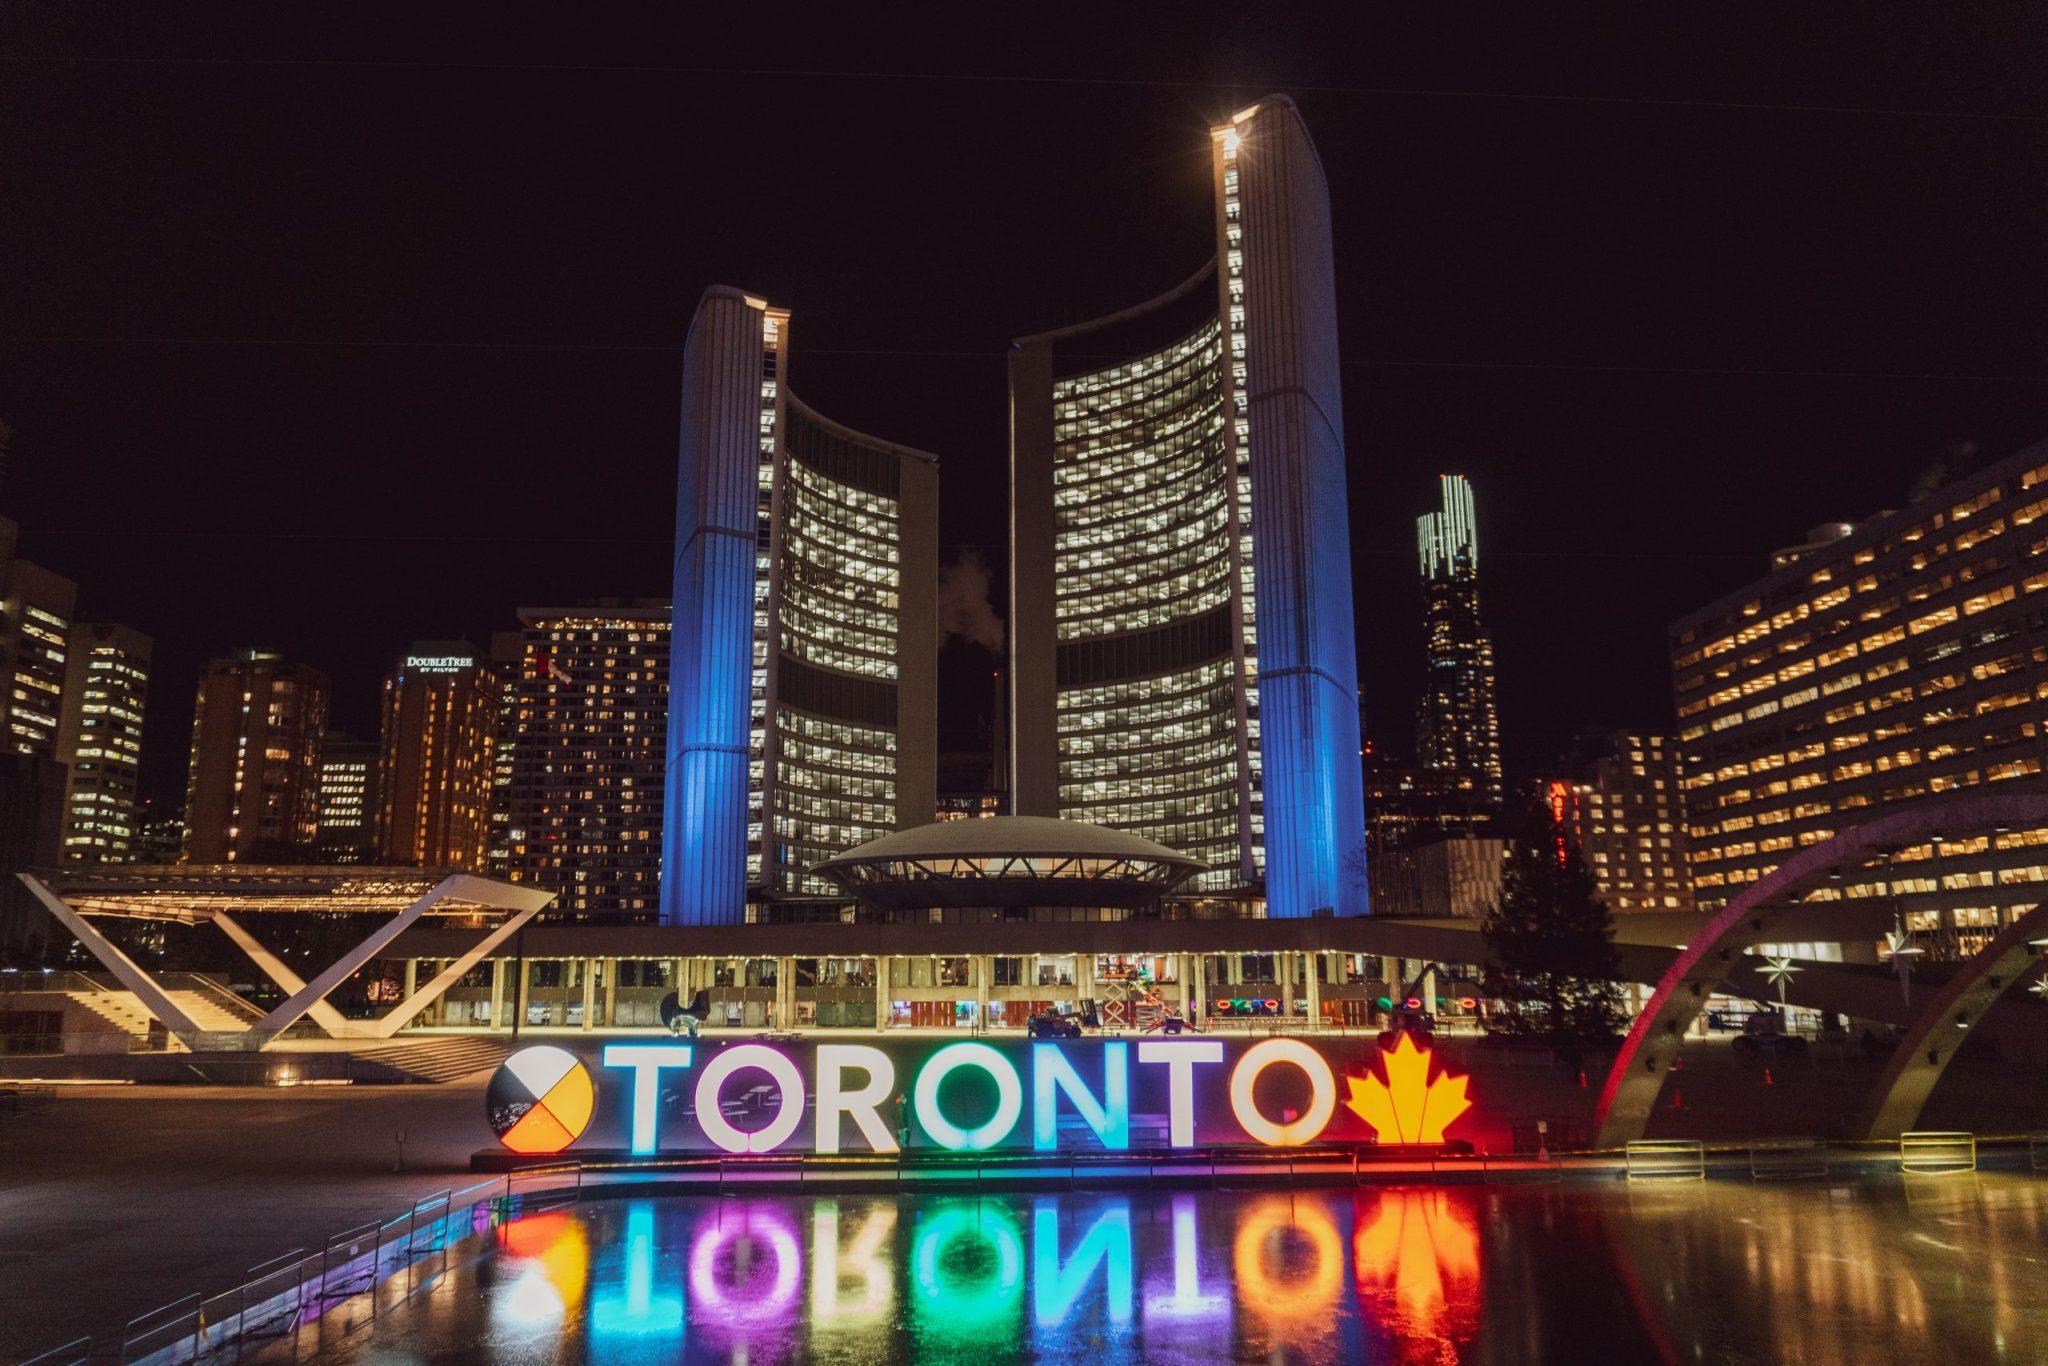 A nighttime photo of Toronto